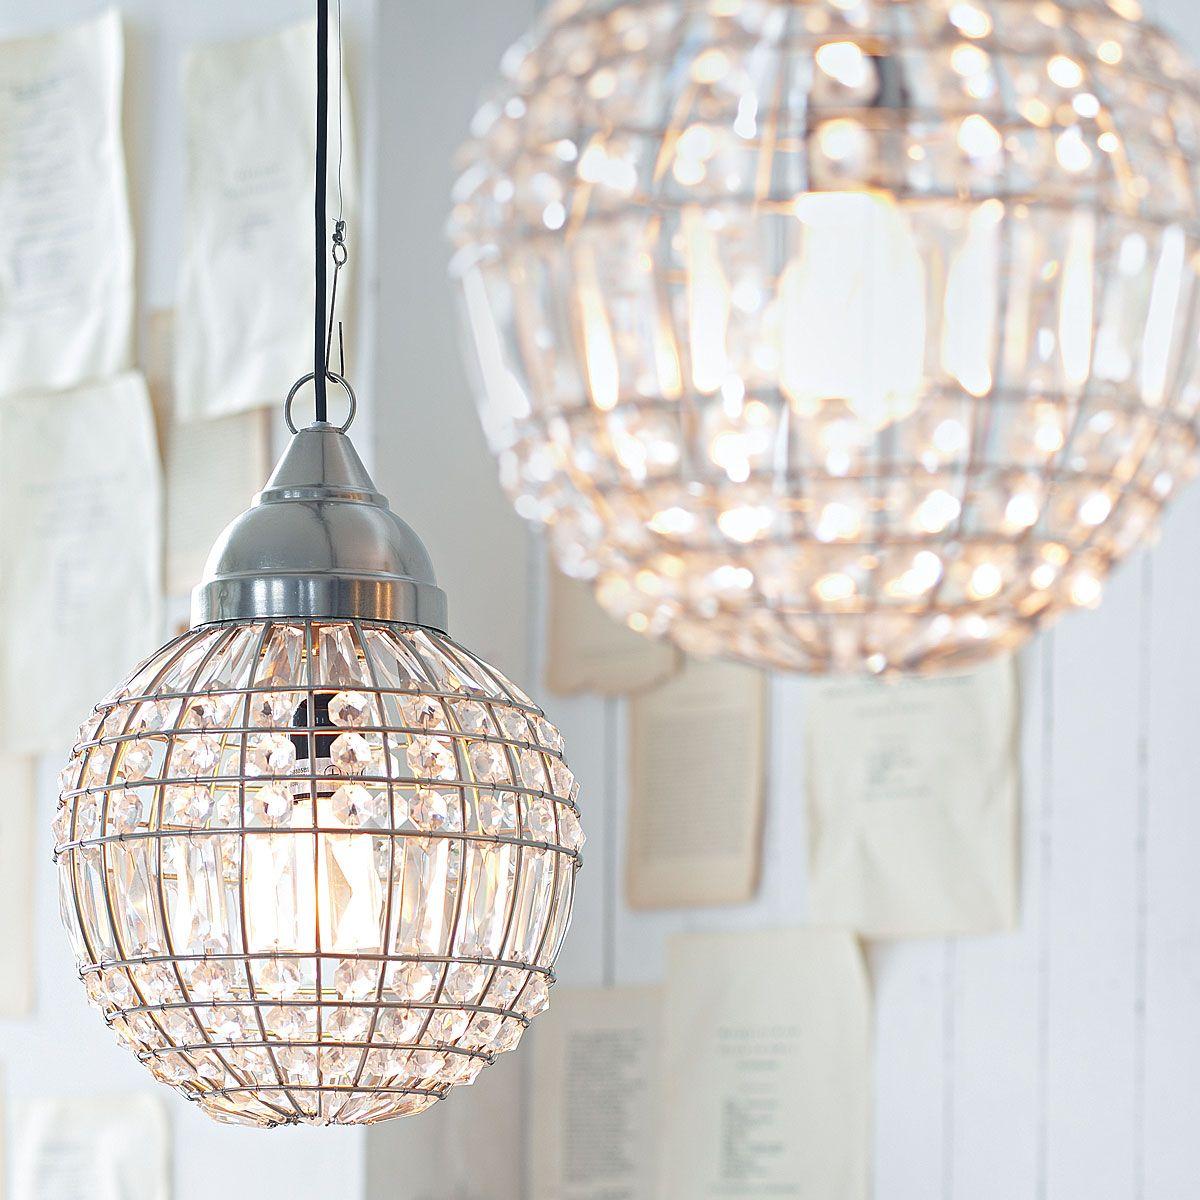 Pin von Julie Jones auf my house ideas=let there be light ...